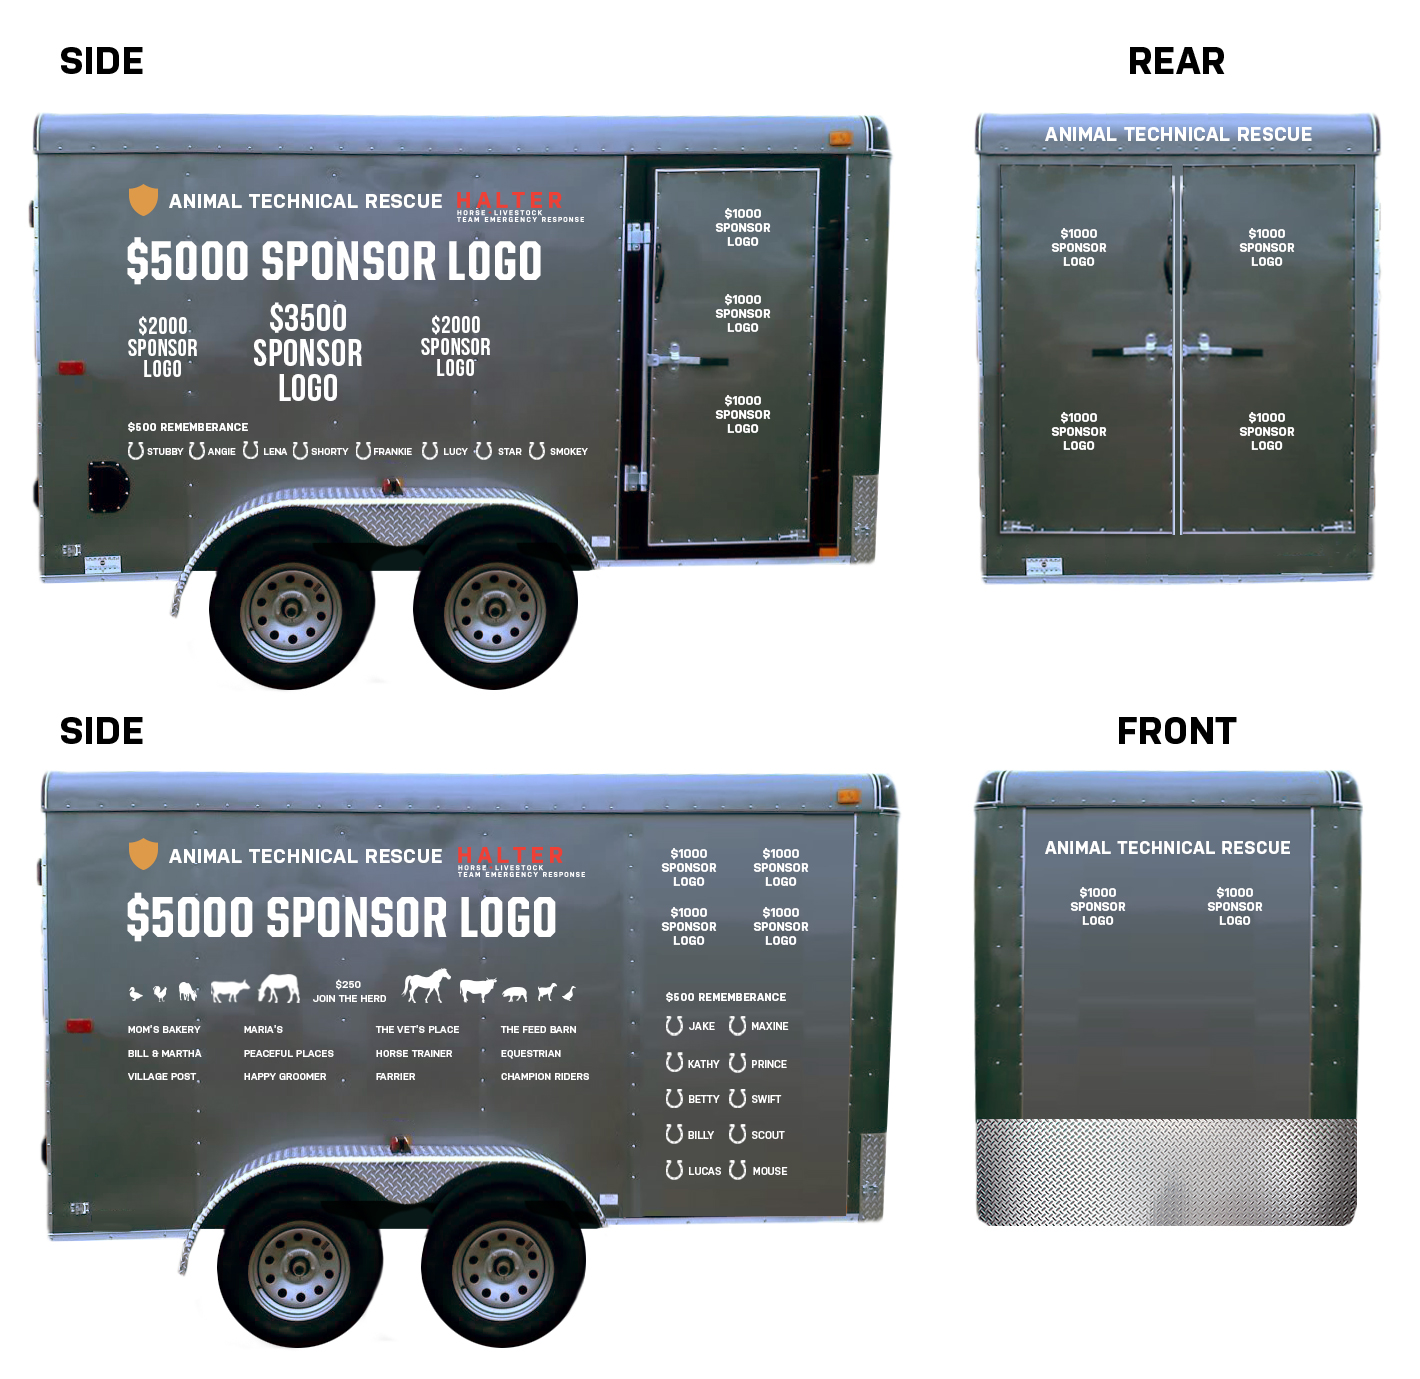 Photos Showing Sponsorship Logo Placement on Trailer Image